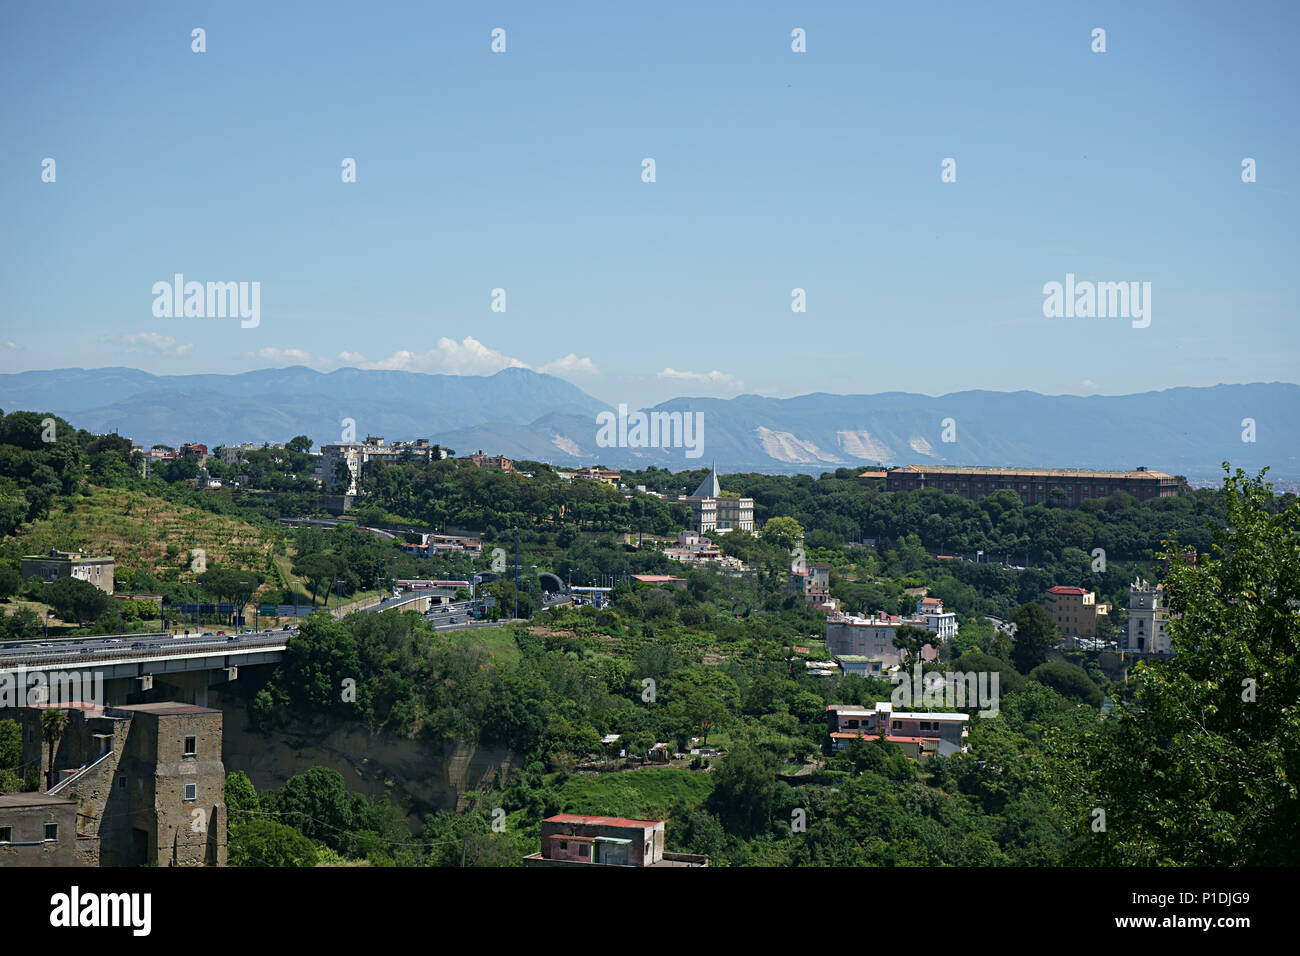 Landscape of Capodimonte an camaldoli City of Naples, Italy - Stock Image